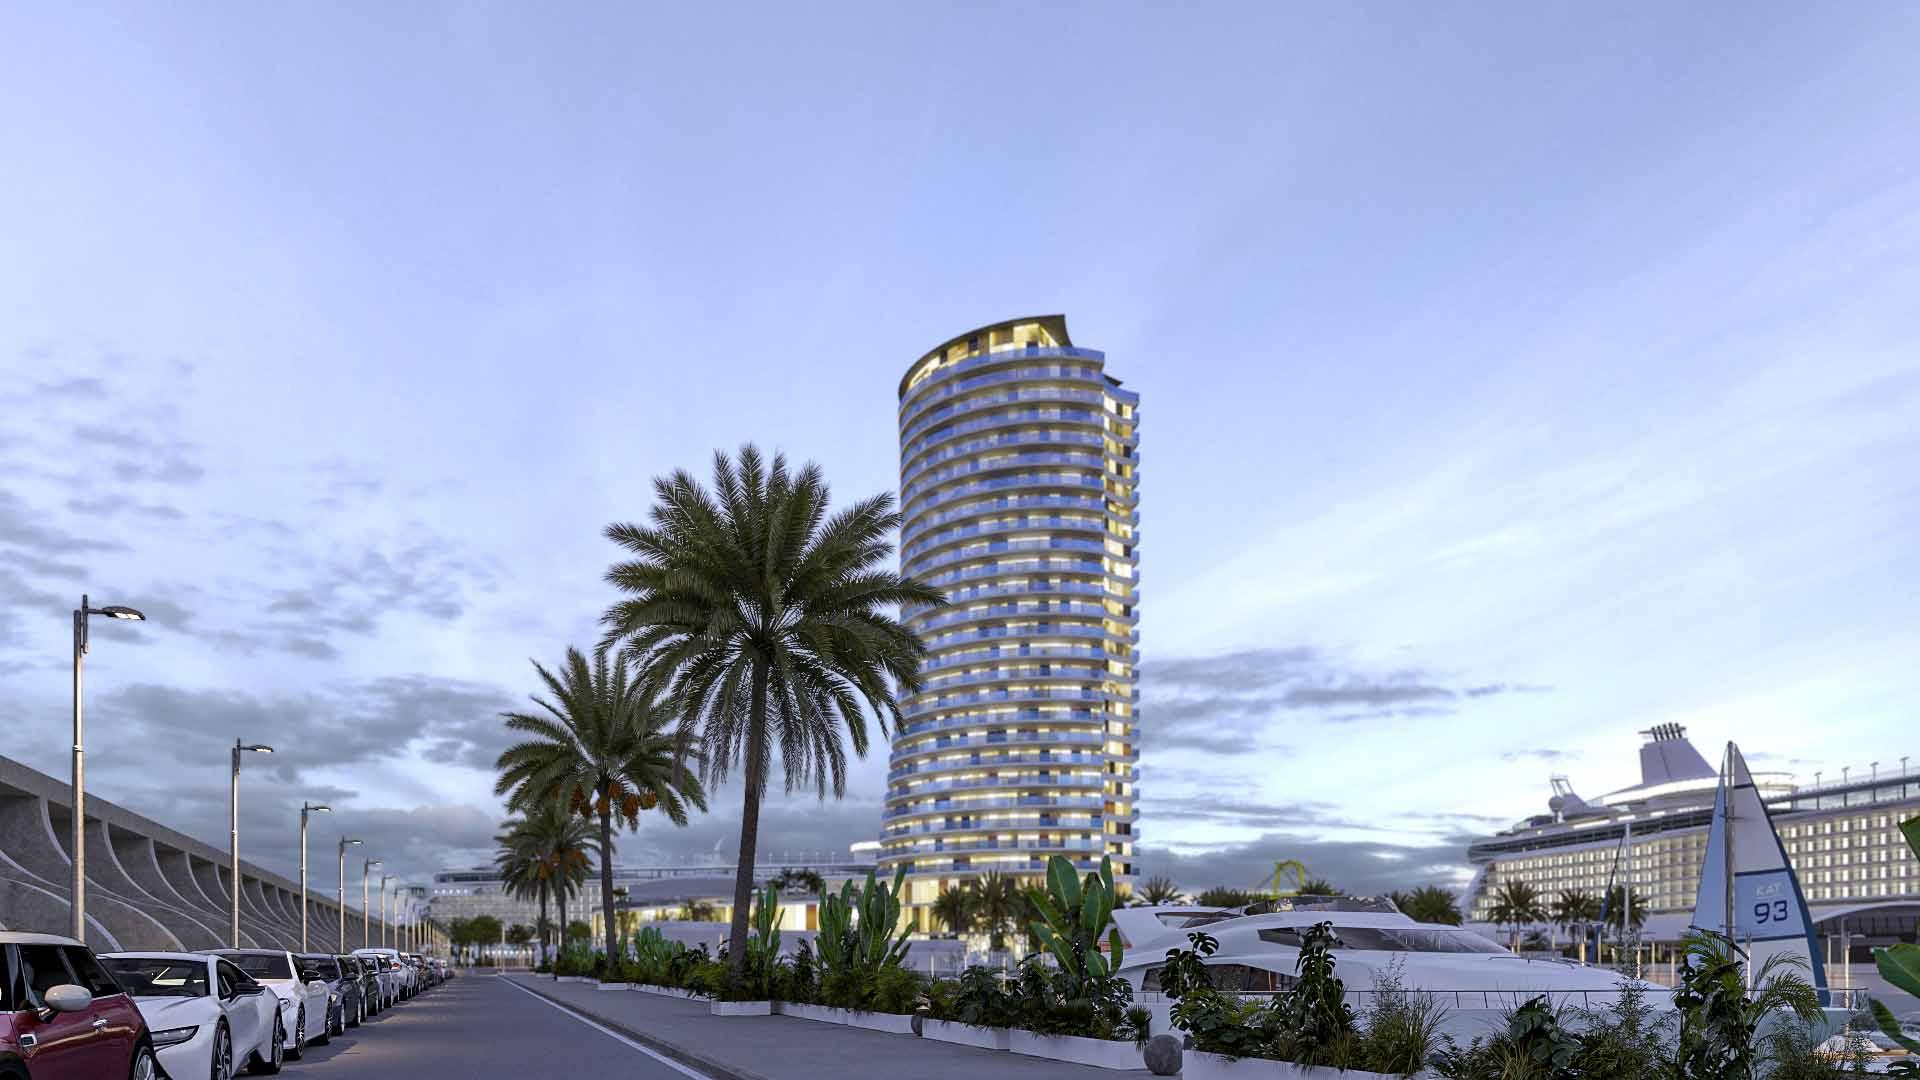 Hotel Torre del Puerto